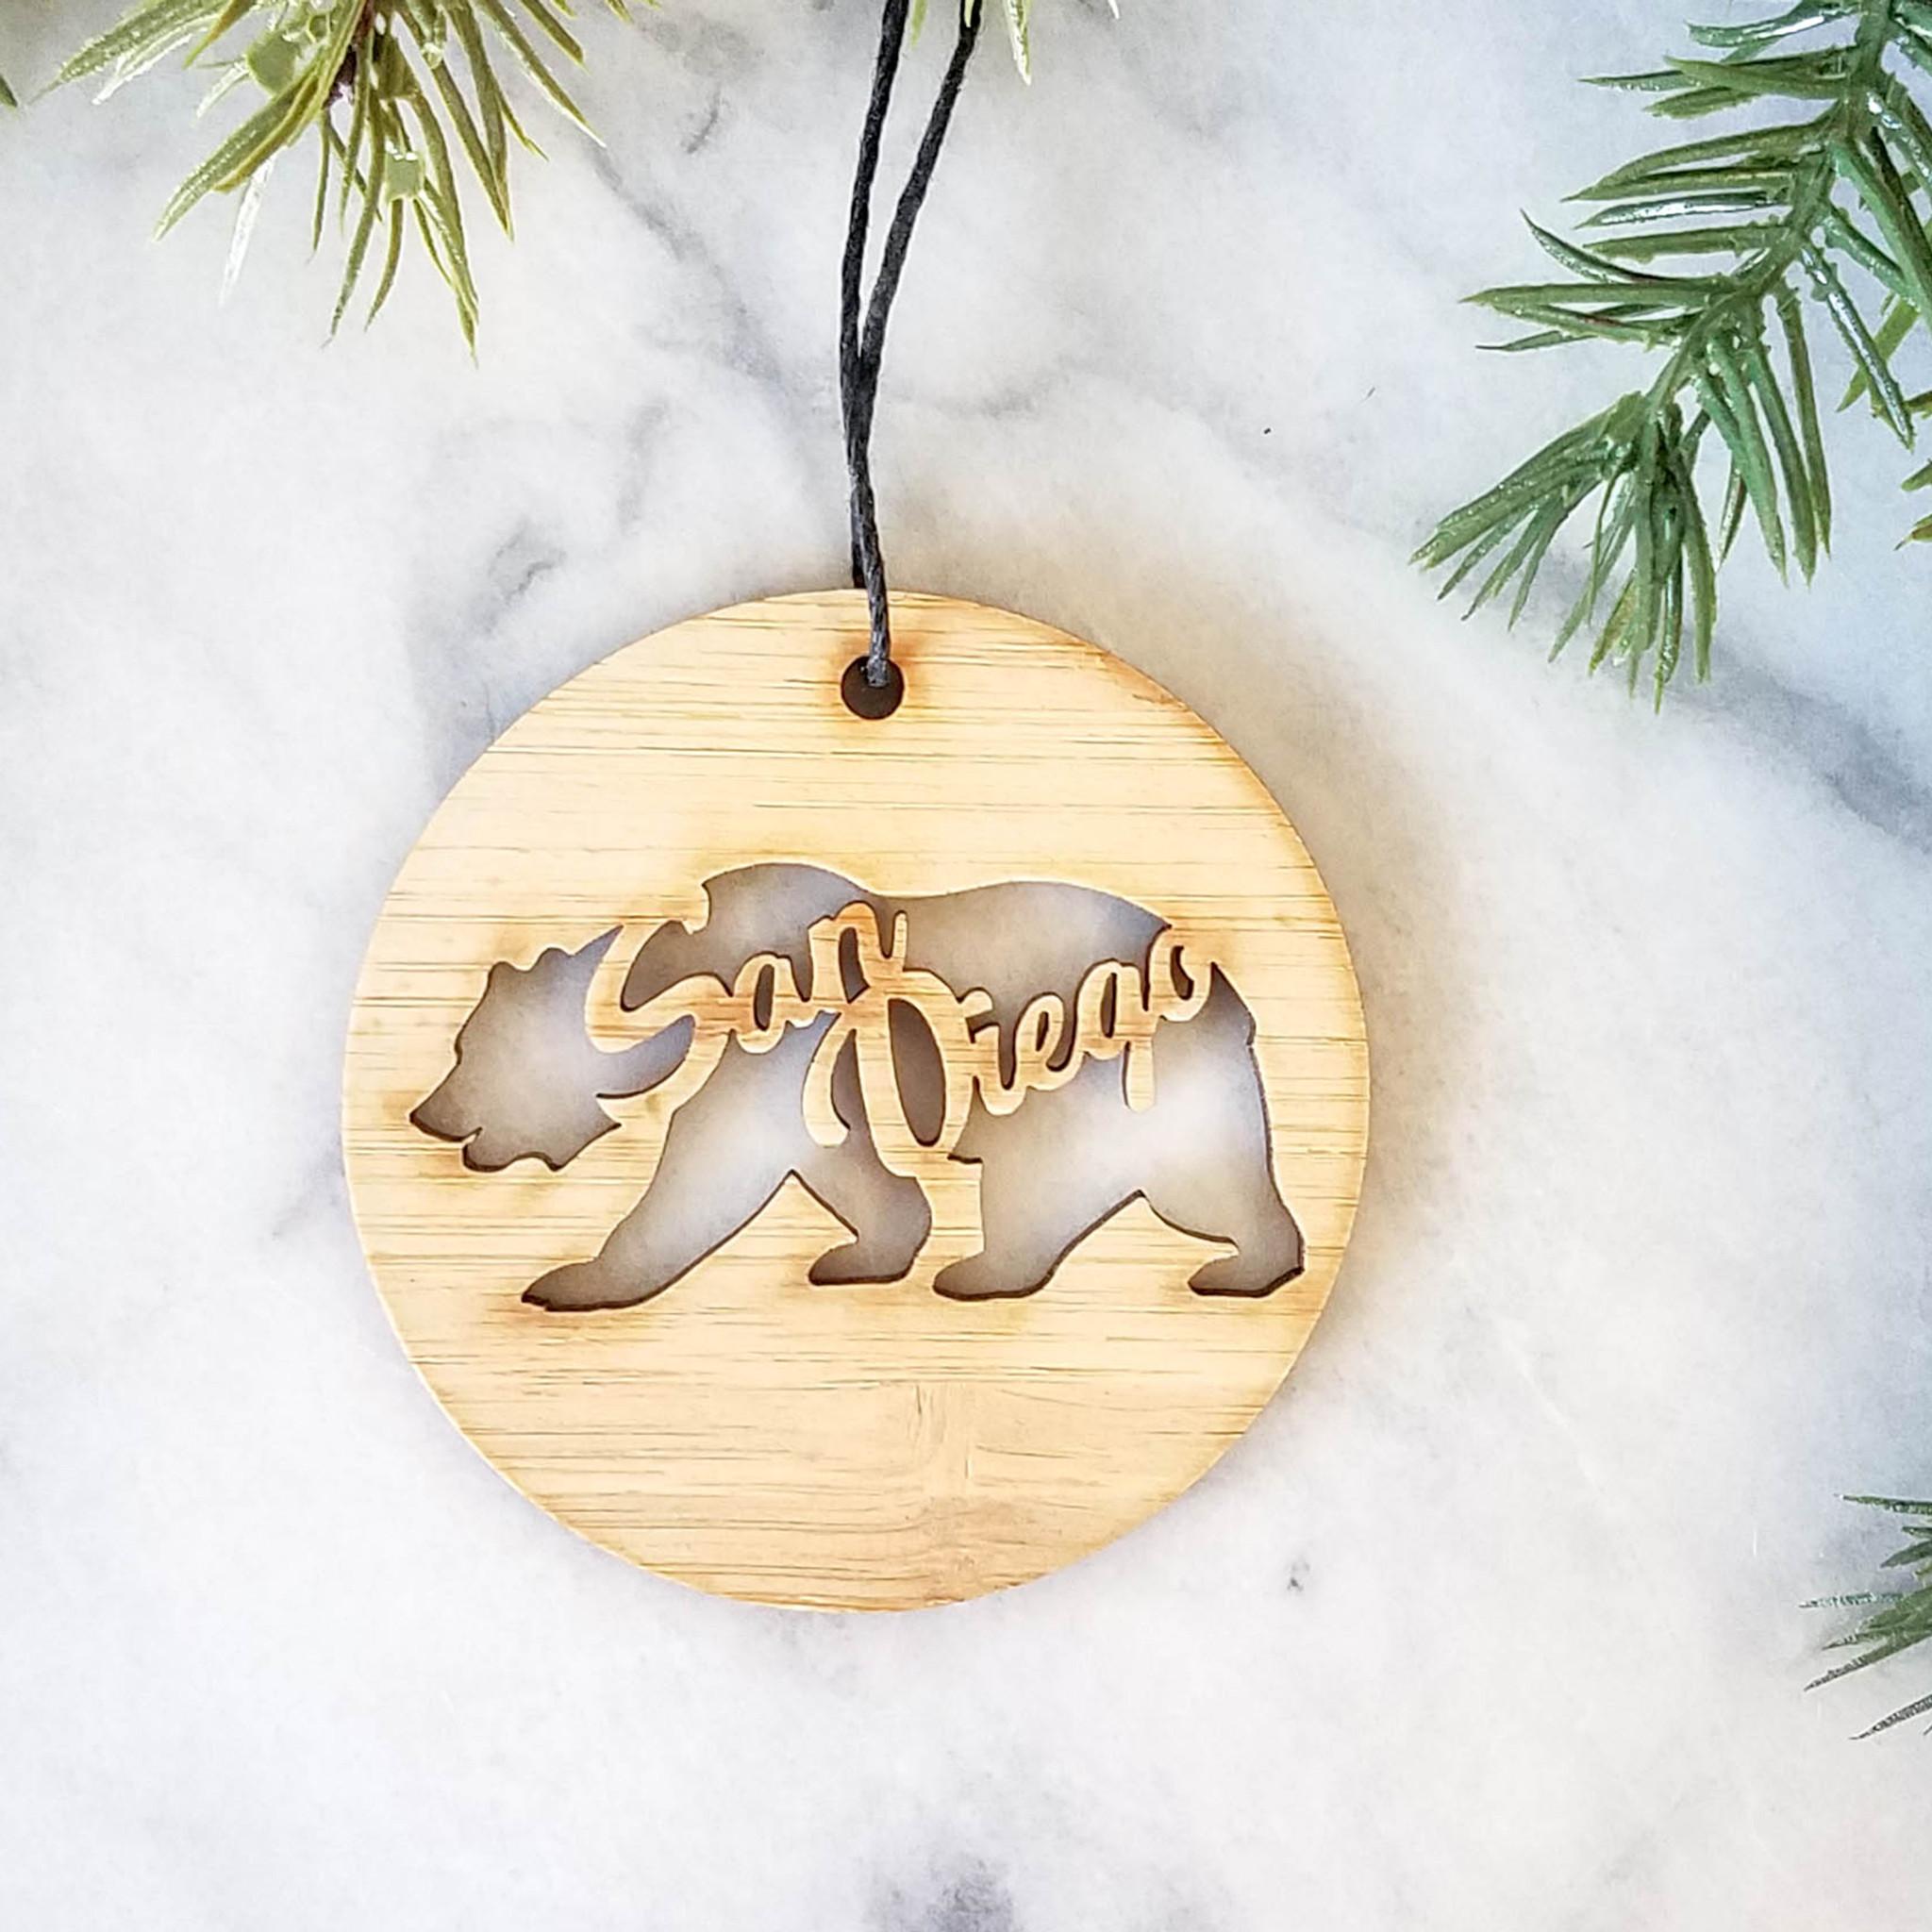 san diego california bear handmade wood ornament